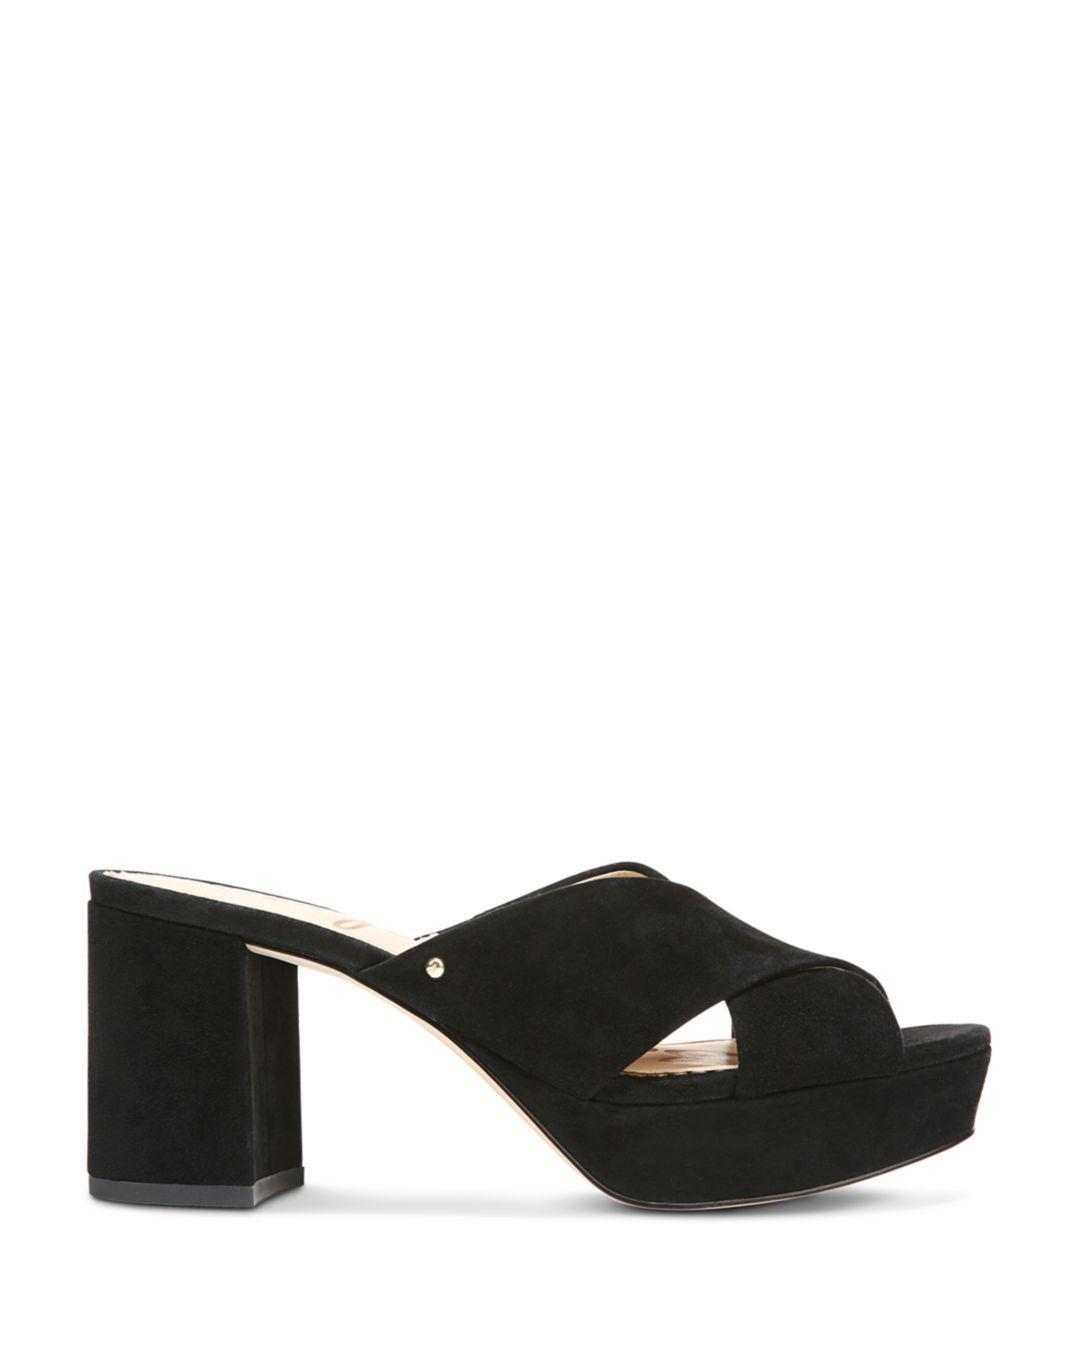 d6468d0b47c Lyst - Sam Edelman Women s Jayne Suede Platform High-heel Slide ...